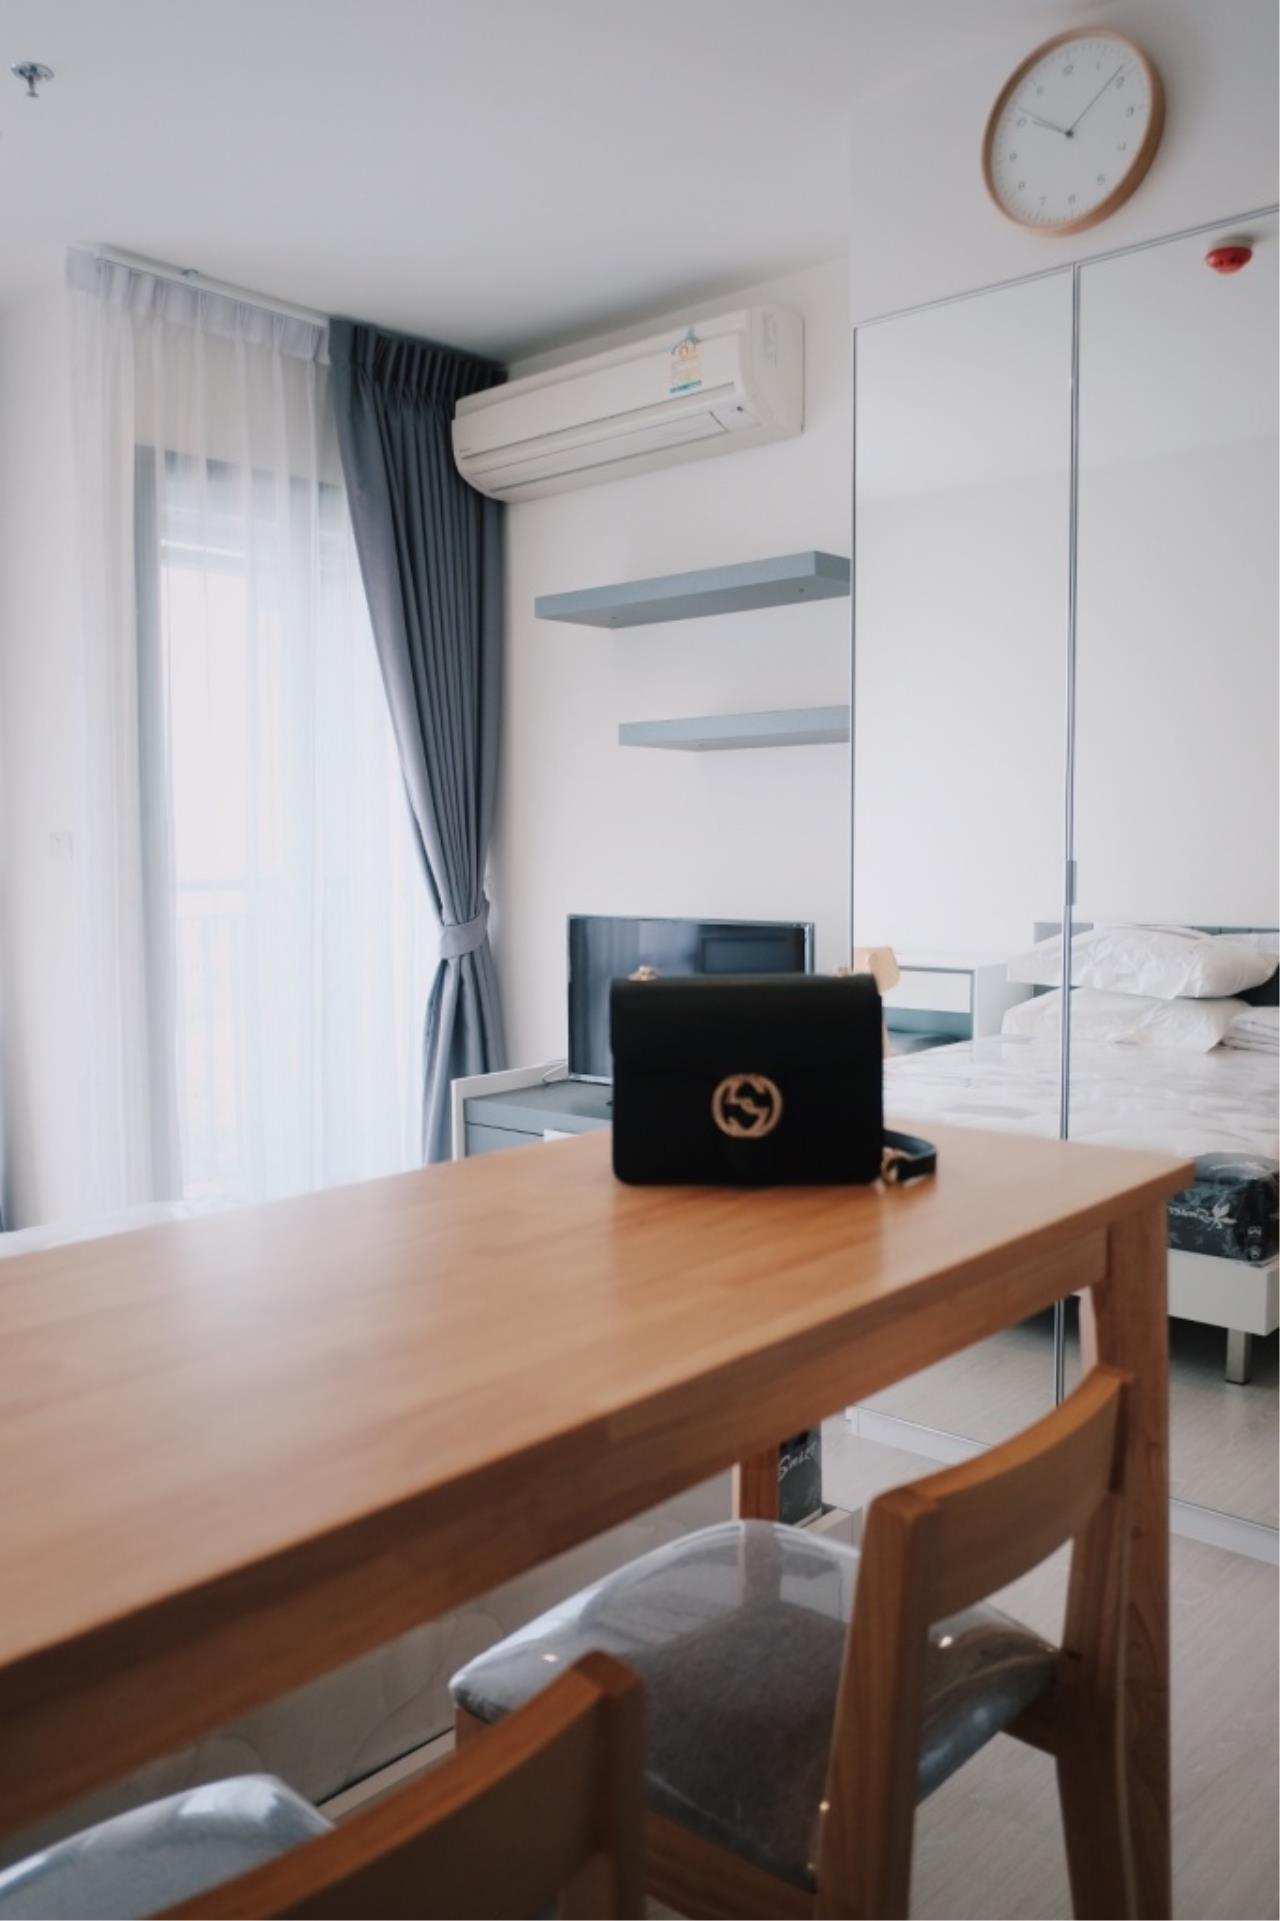 Century21 Skylux Agency's Rhythm Asoke / Condo For Sale / 1 Bedroom / 21.5 SQM / BTS Asok / Bangkok 4